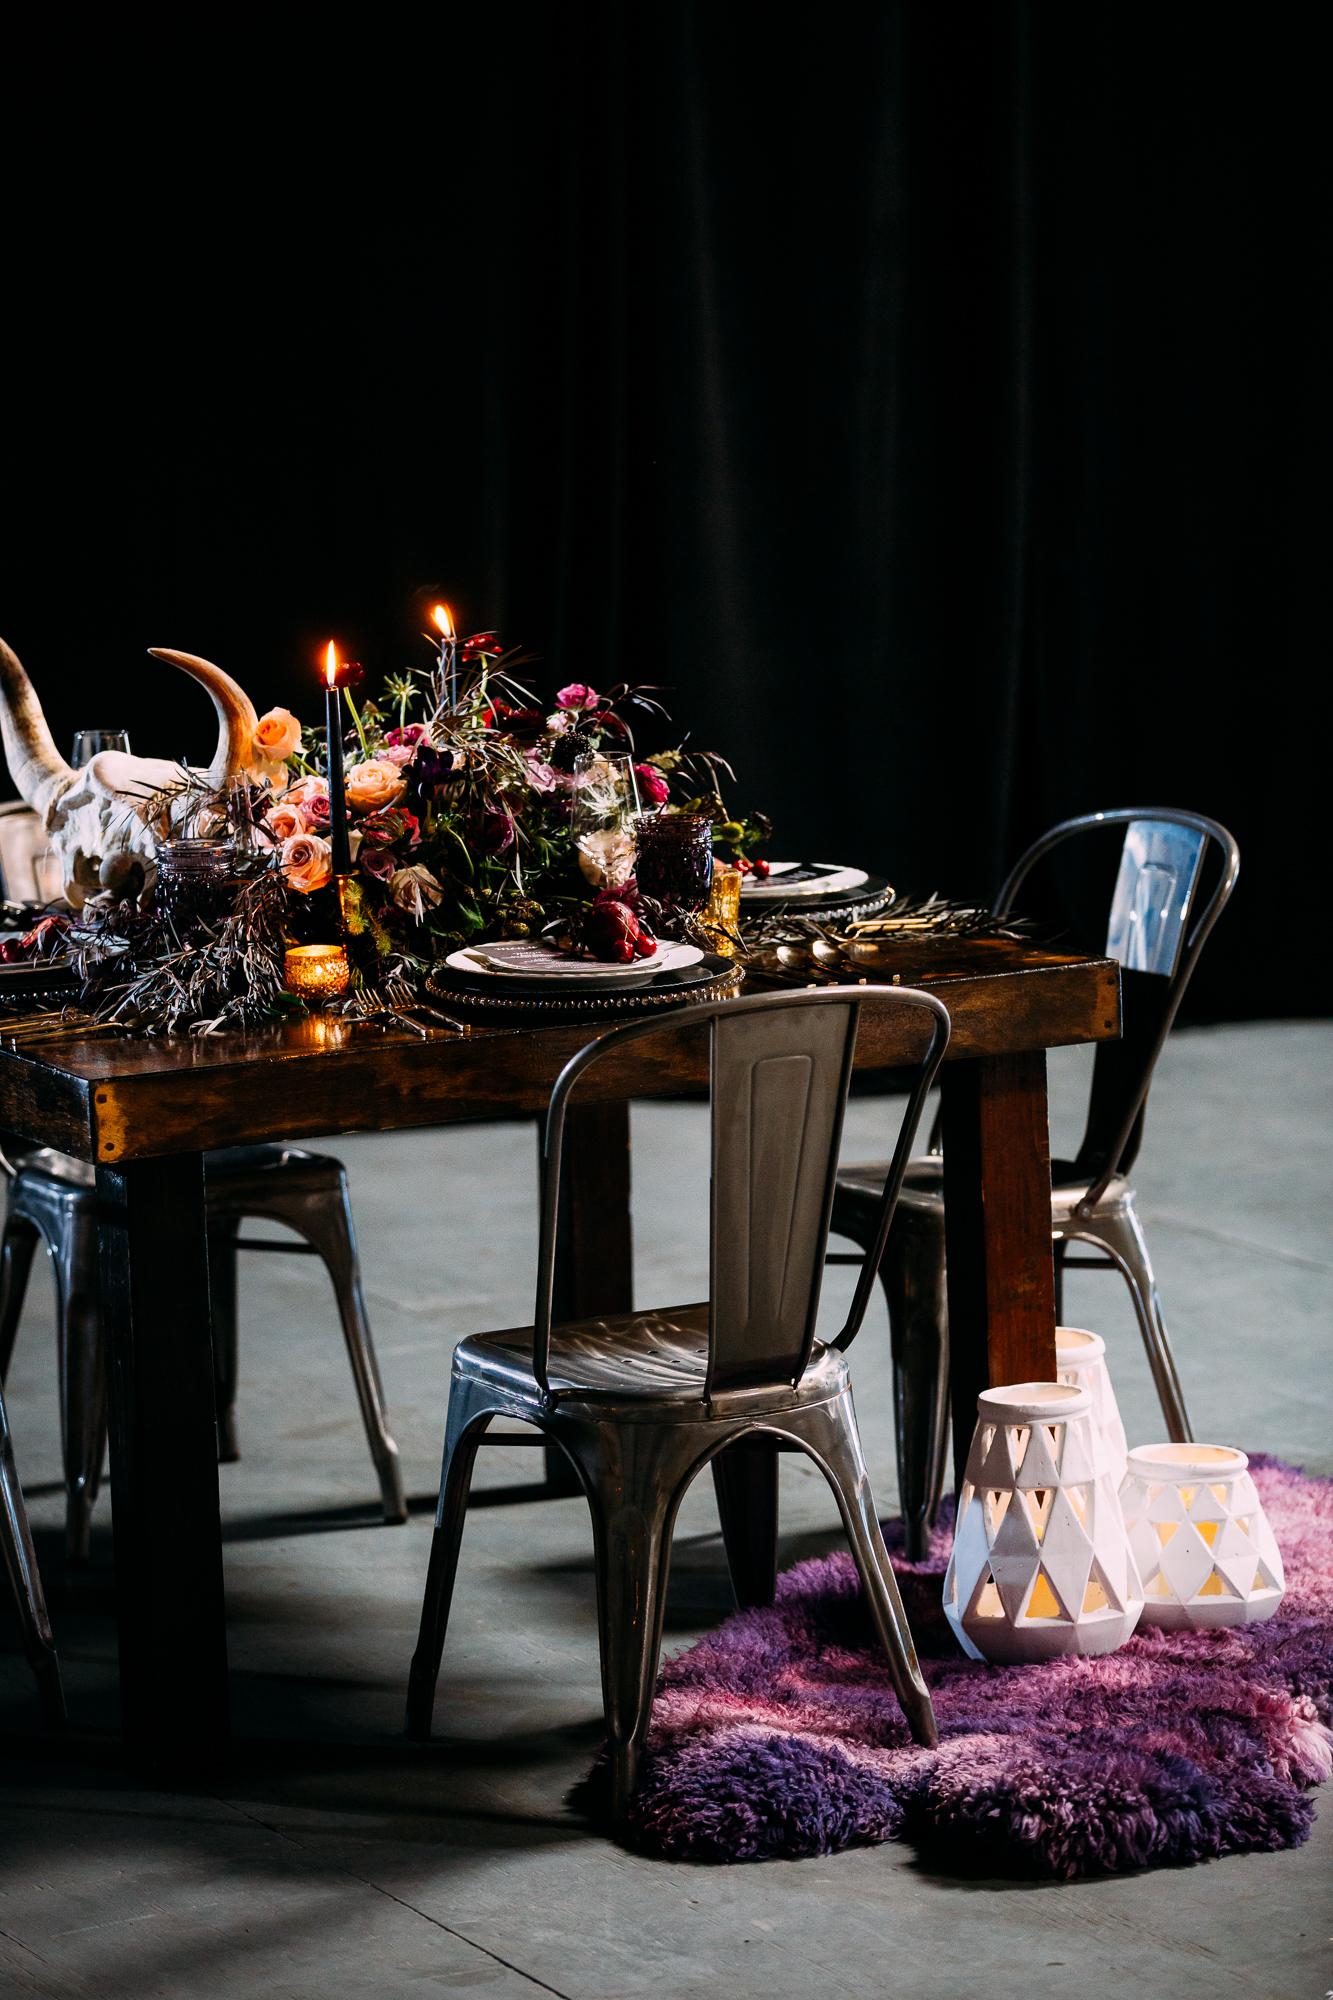 2017.1.29-Alternative-Wedding-Styled-Shoot-Sarah-Mack-Photo 60.jpg